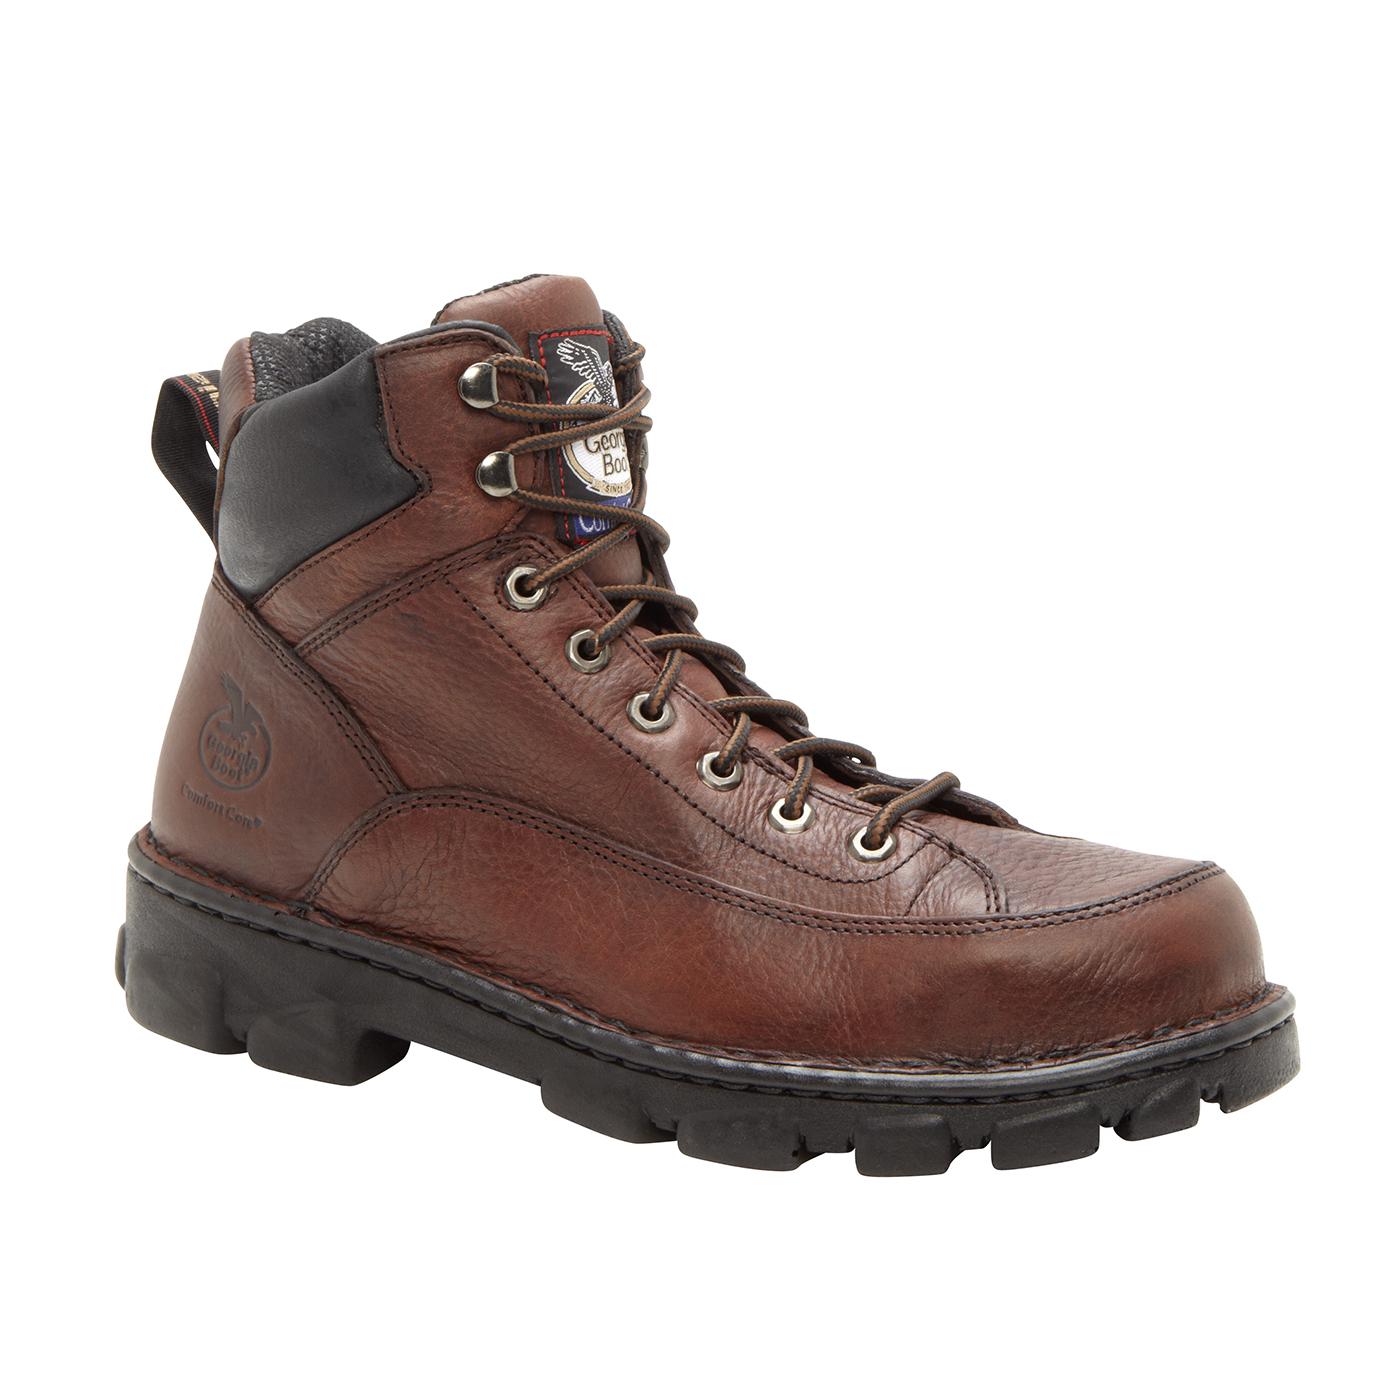 Eagle Light Wide Load Steel Toe Work Boots G6395